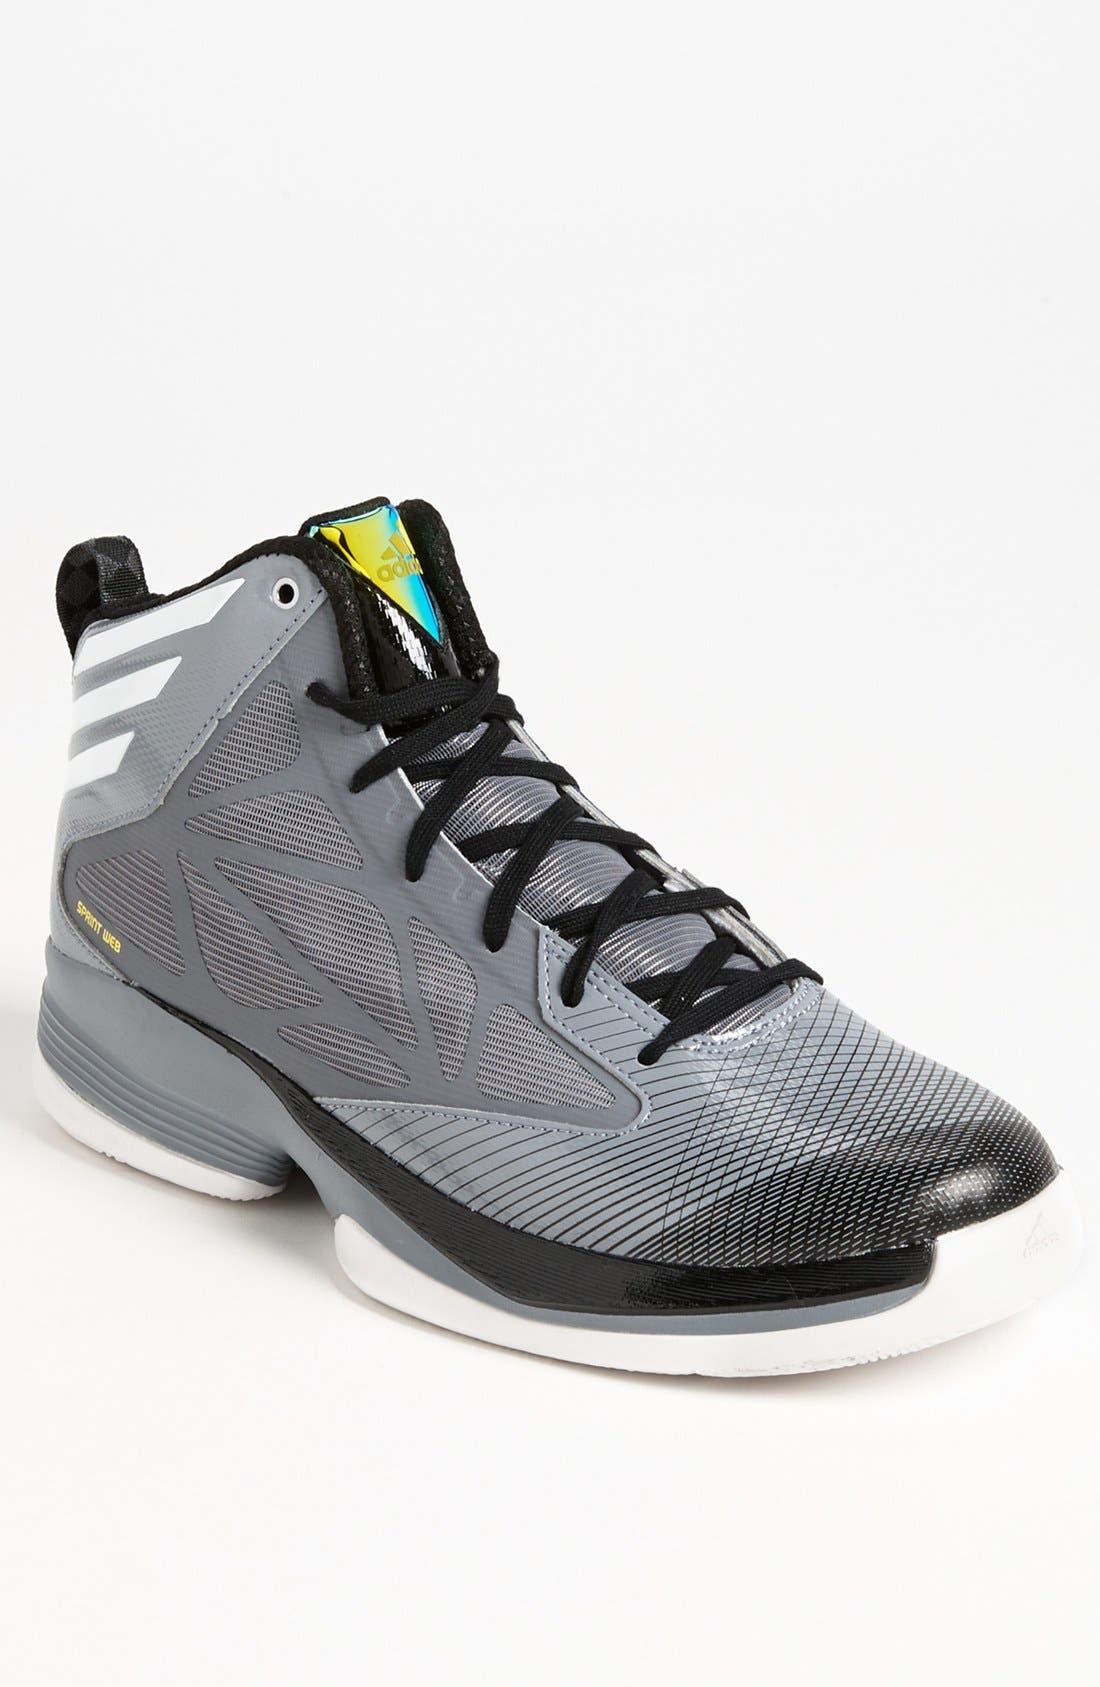 Alternate Image 1 Selected - adidas 'Crazy Fast' Basketball Shoe (Men)